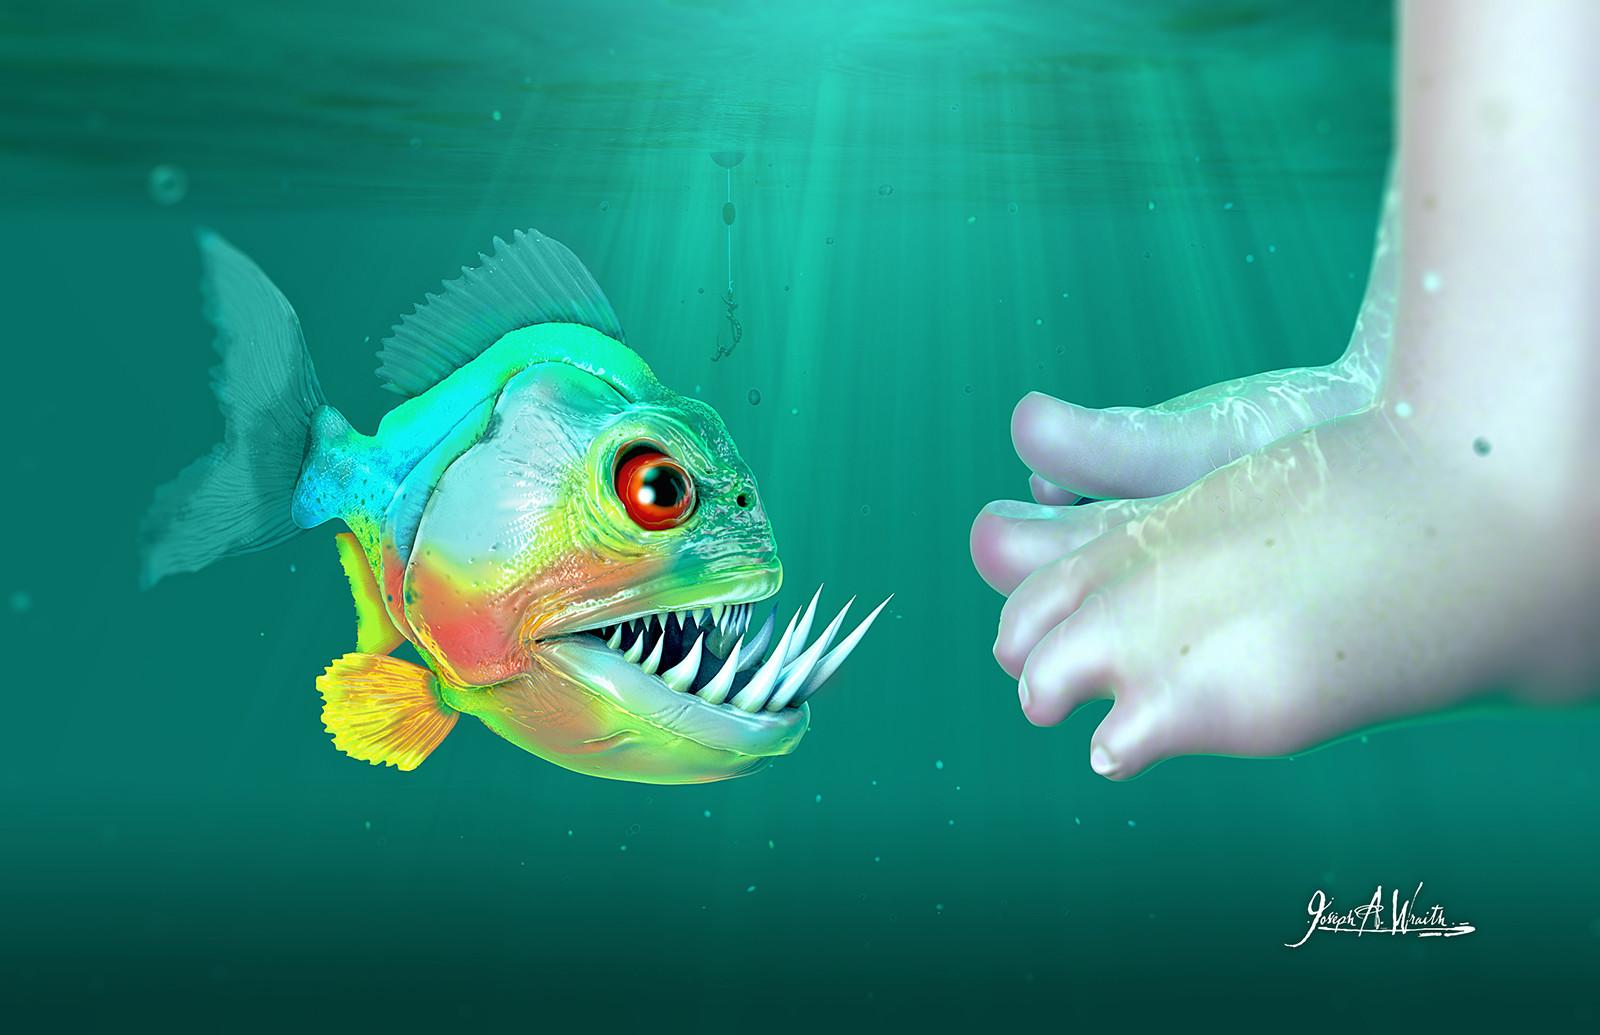 Joseph wraith fugly fish2 1600